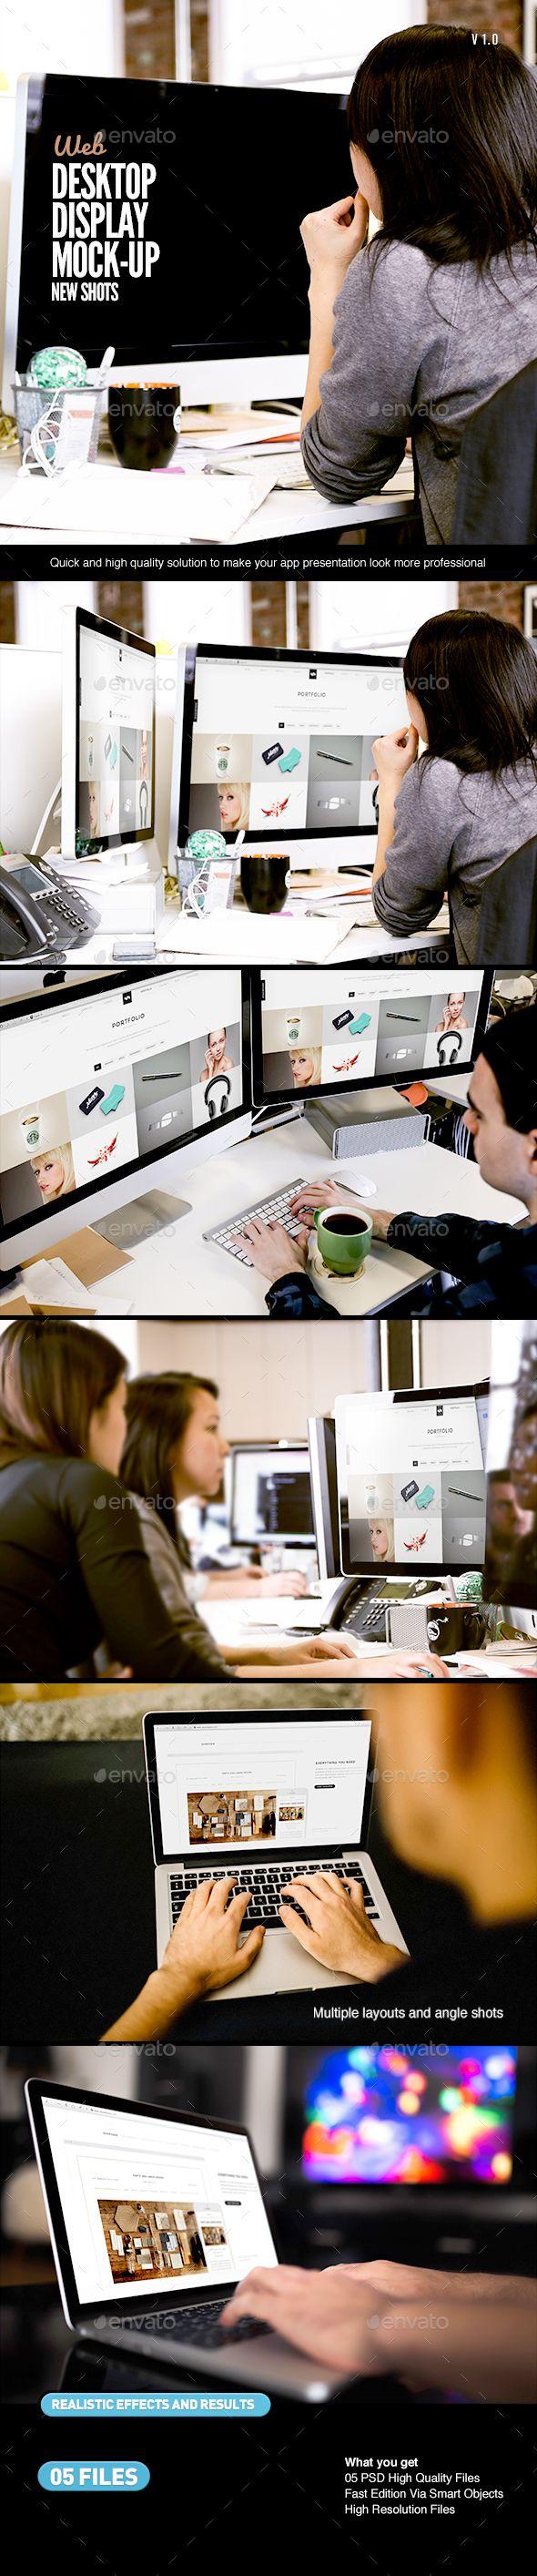 Desktop Screen Work Display Mock Up Displays